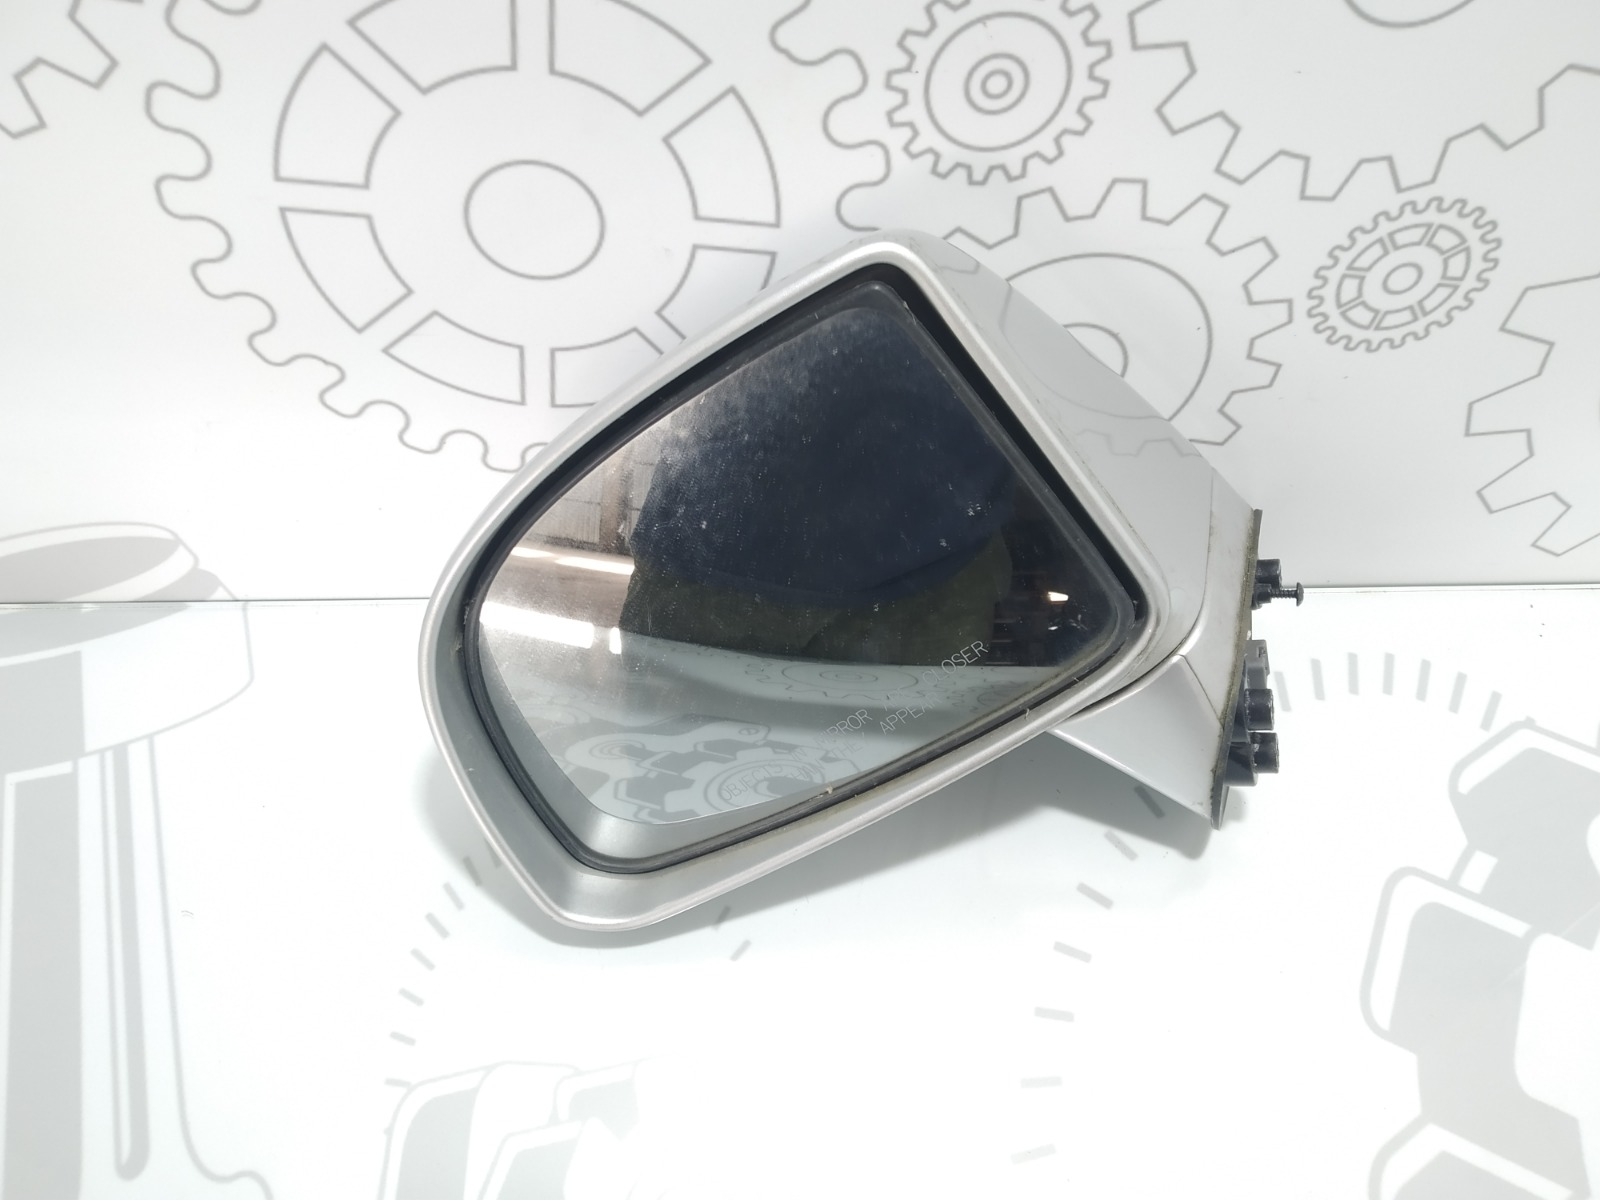 Зеркало наружное левое Kia Carens 2.0 CRDI 2006 (б/у)